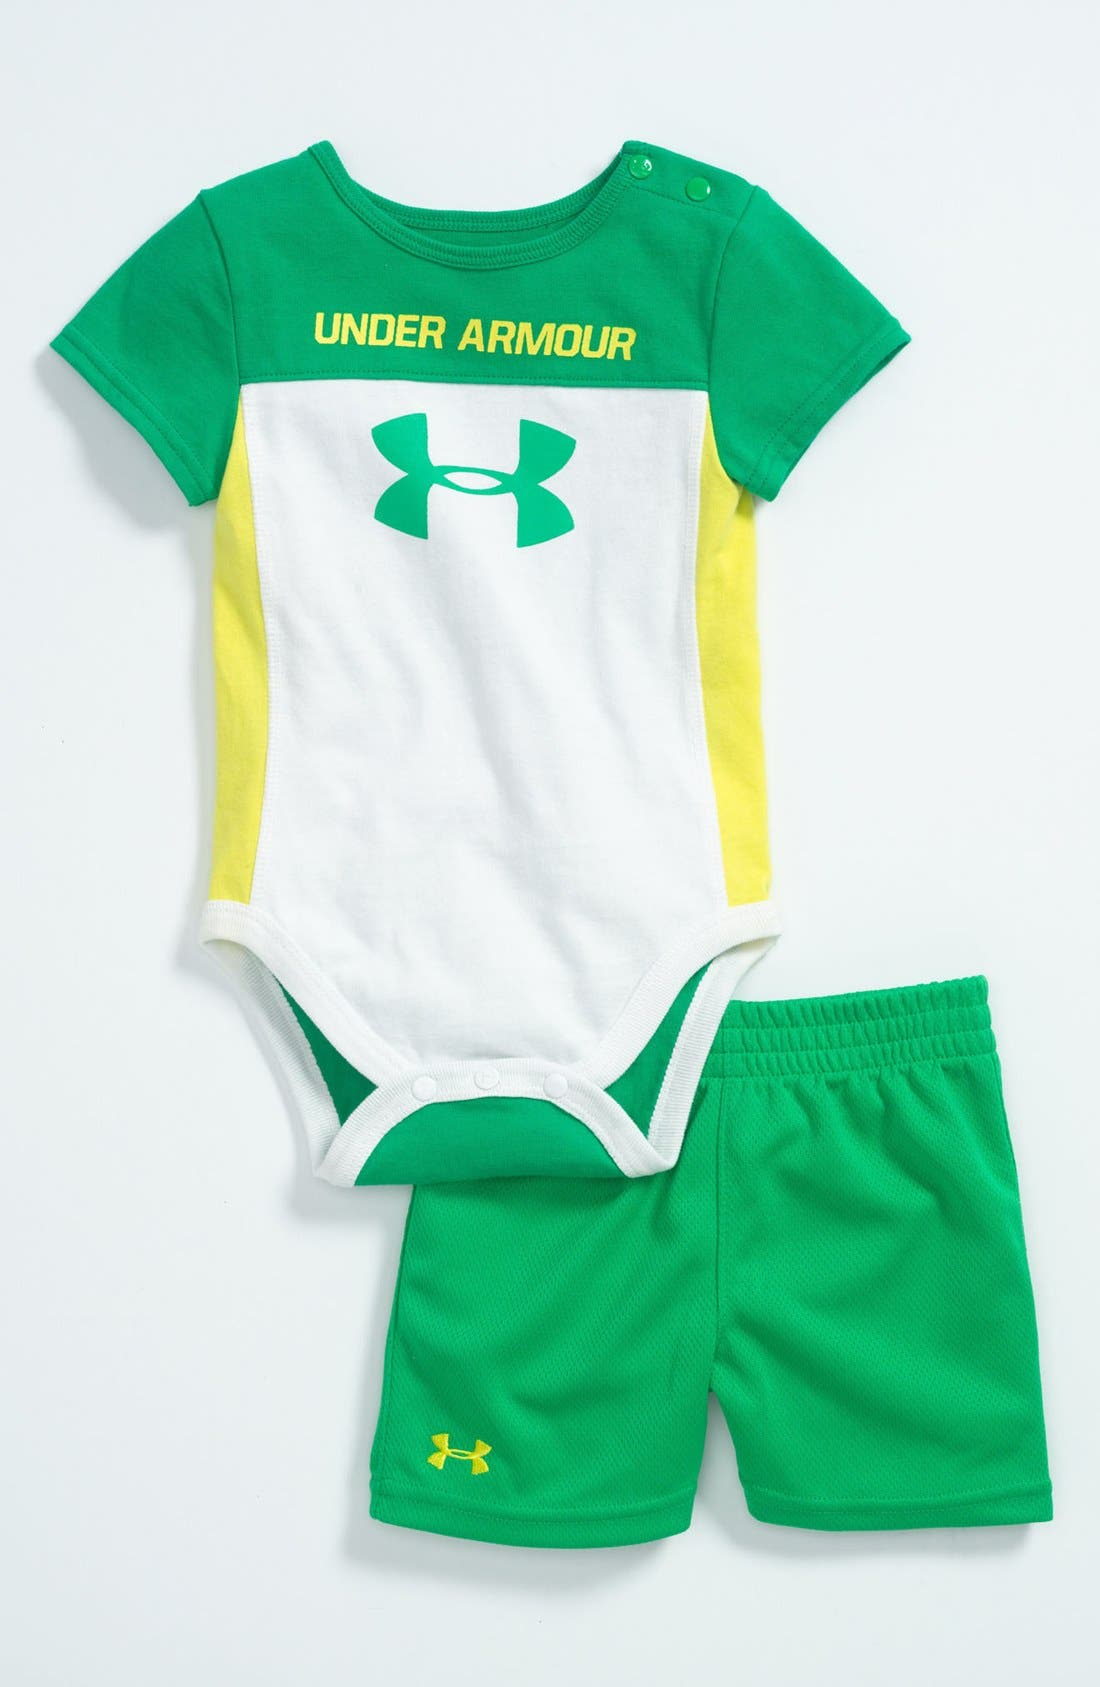 Alternate Image 1 Selected - Under Armour 'Mixed Media' Bodysuit & Shorts (Baby)